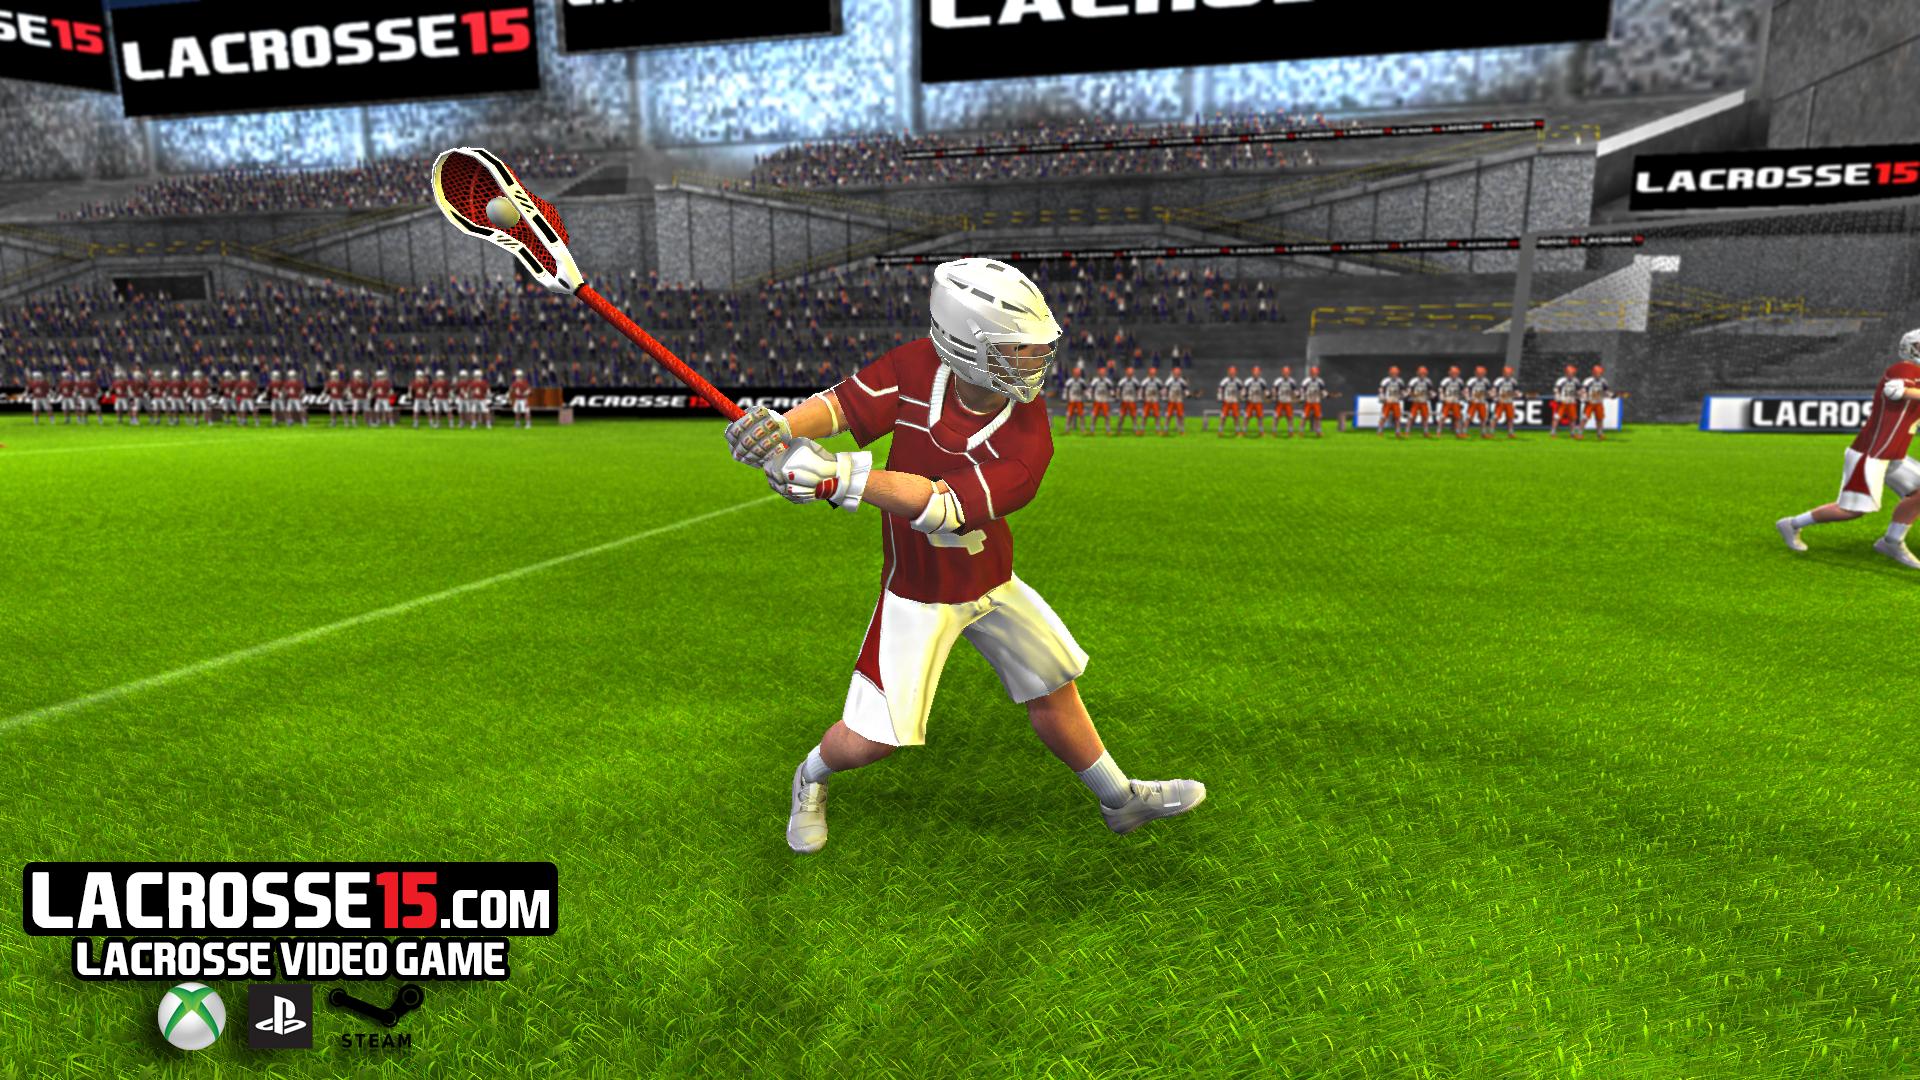 lacrosse wallpapers iphone